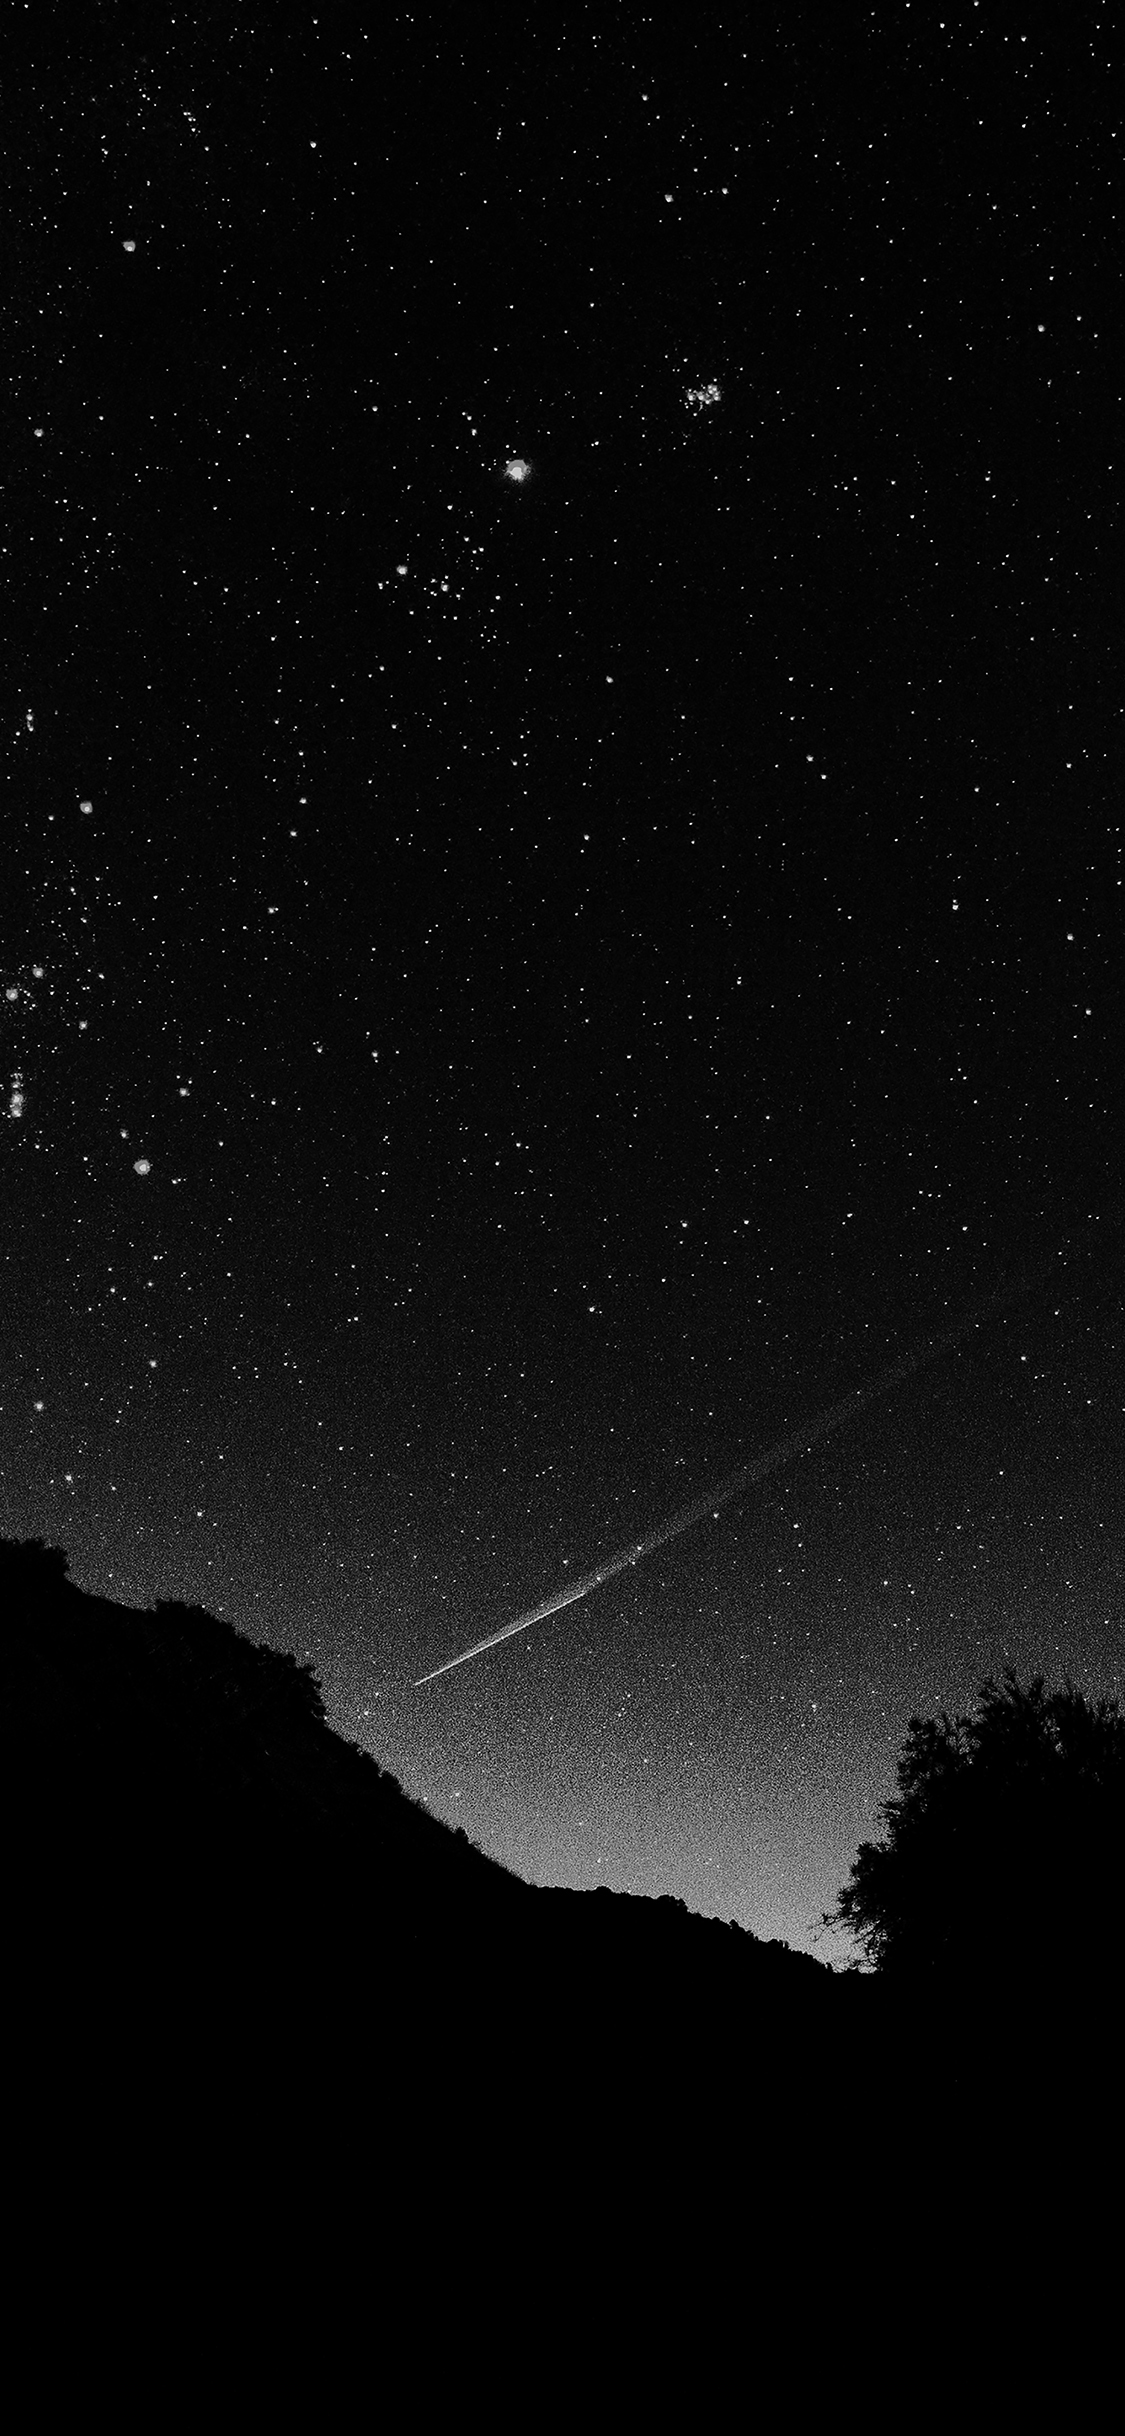 Falling Star Wallpaper Hd Mg37 Astronomy Space Black Sky Night Beautiful Falling